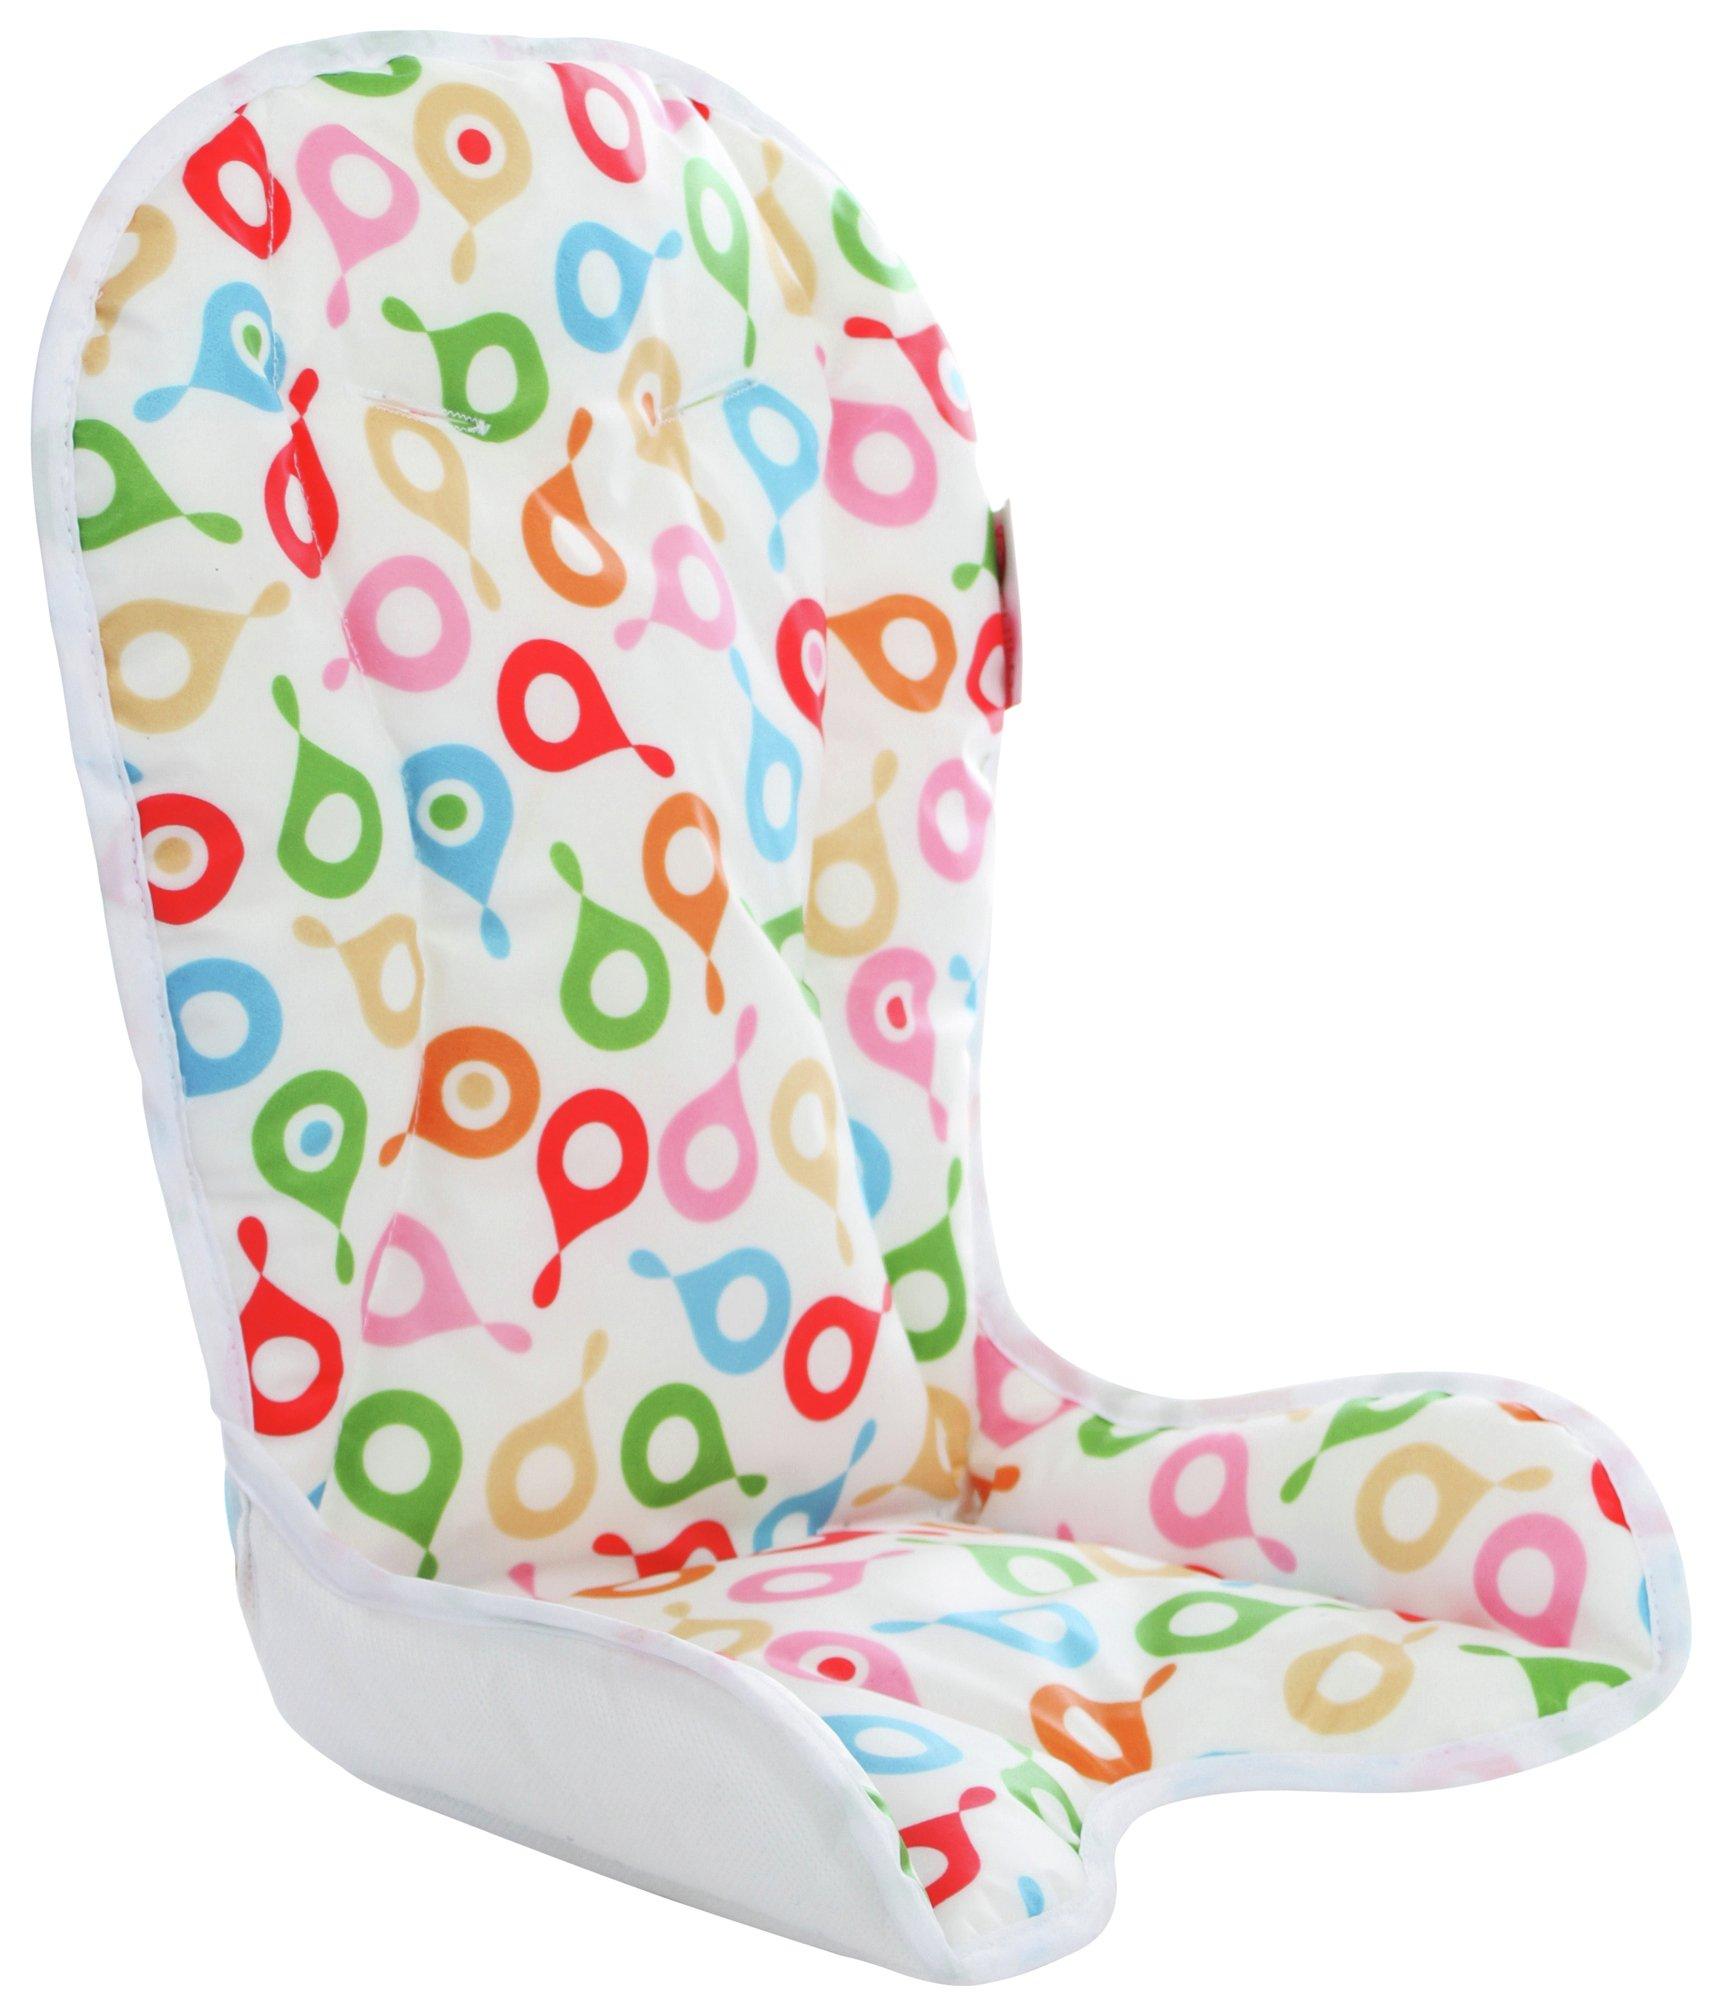 Image of MyChild - Graze Insert Seat Cushion - Multi